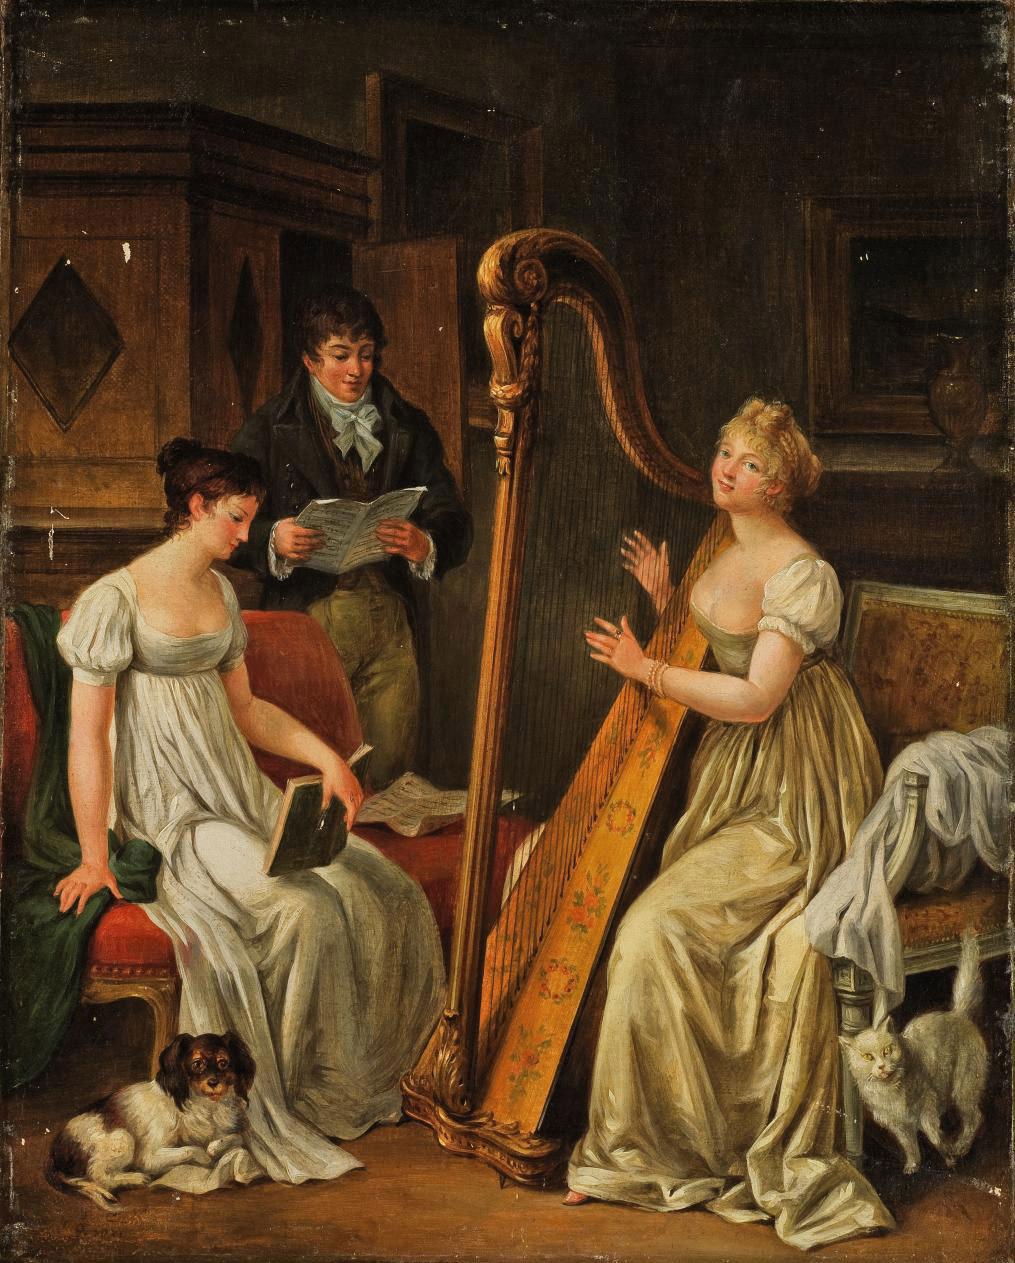 Elegant figures making music in an interior